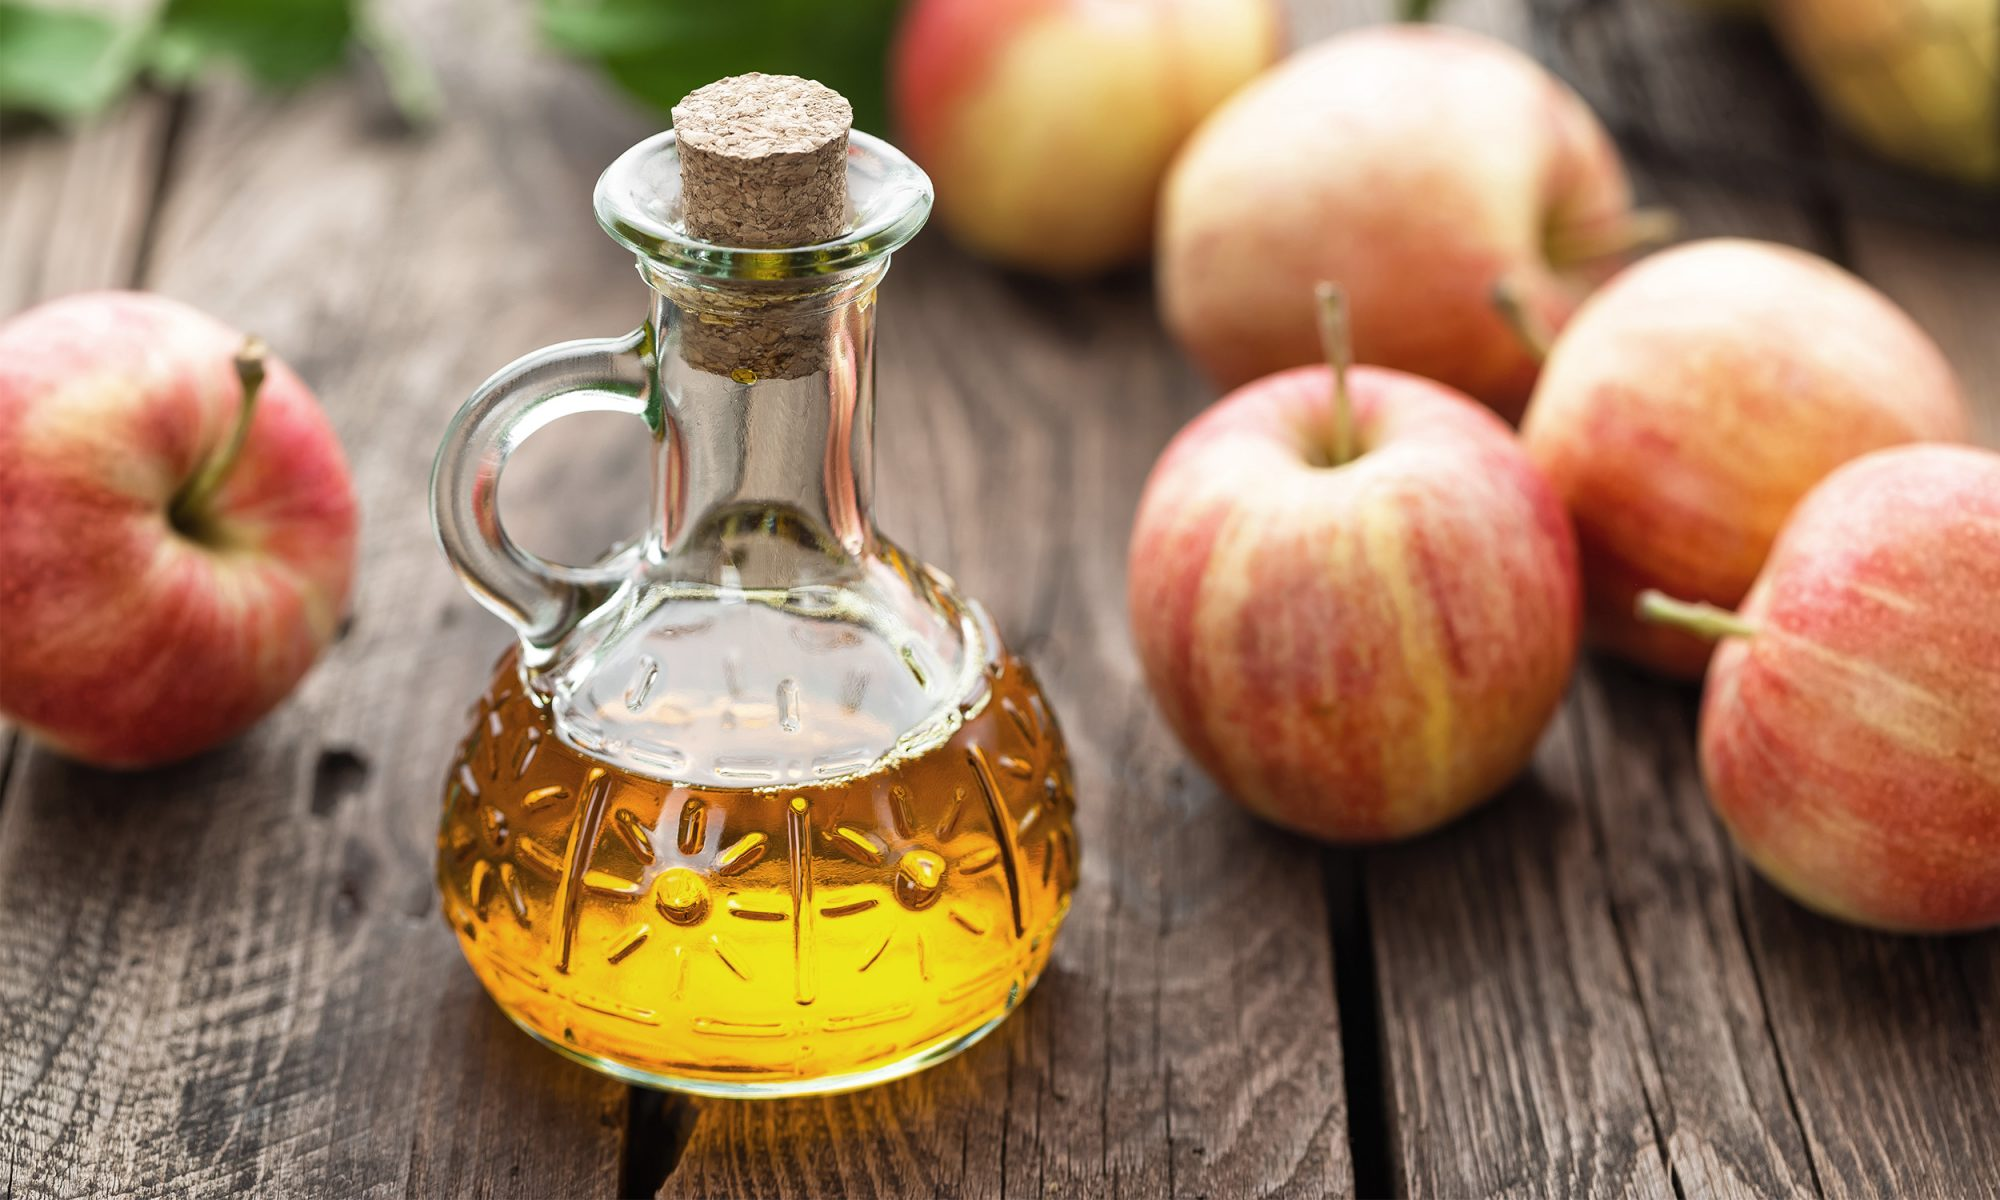 「Vinegar Health」の画像検索結果